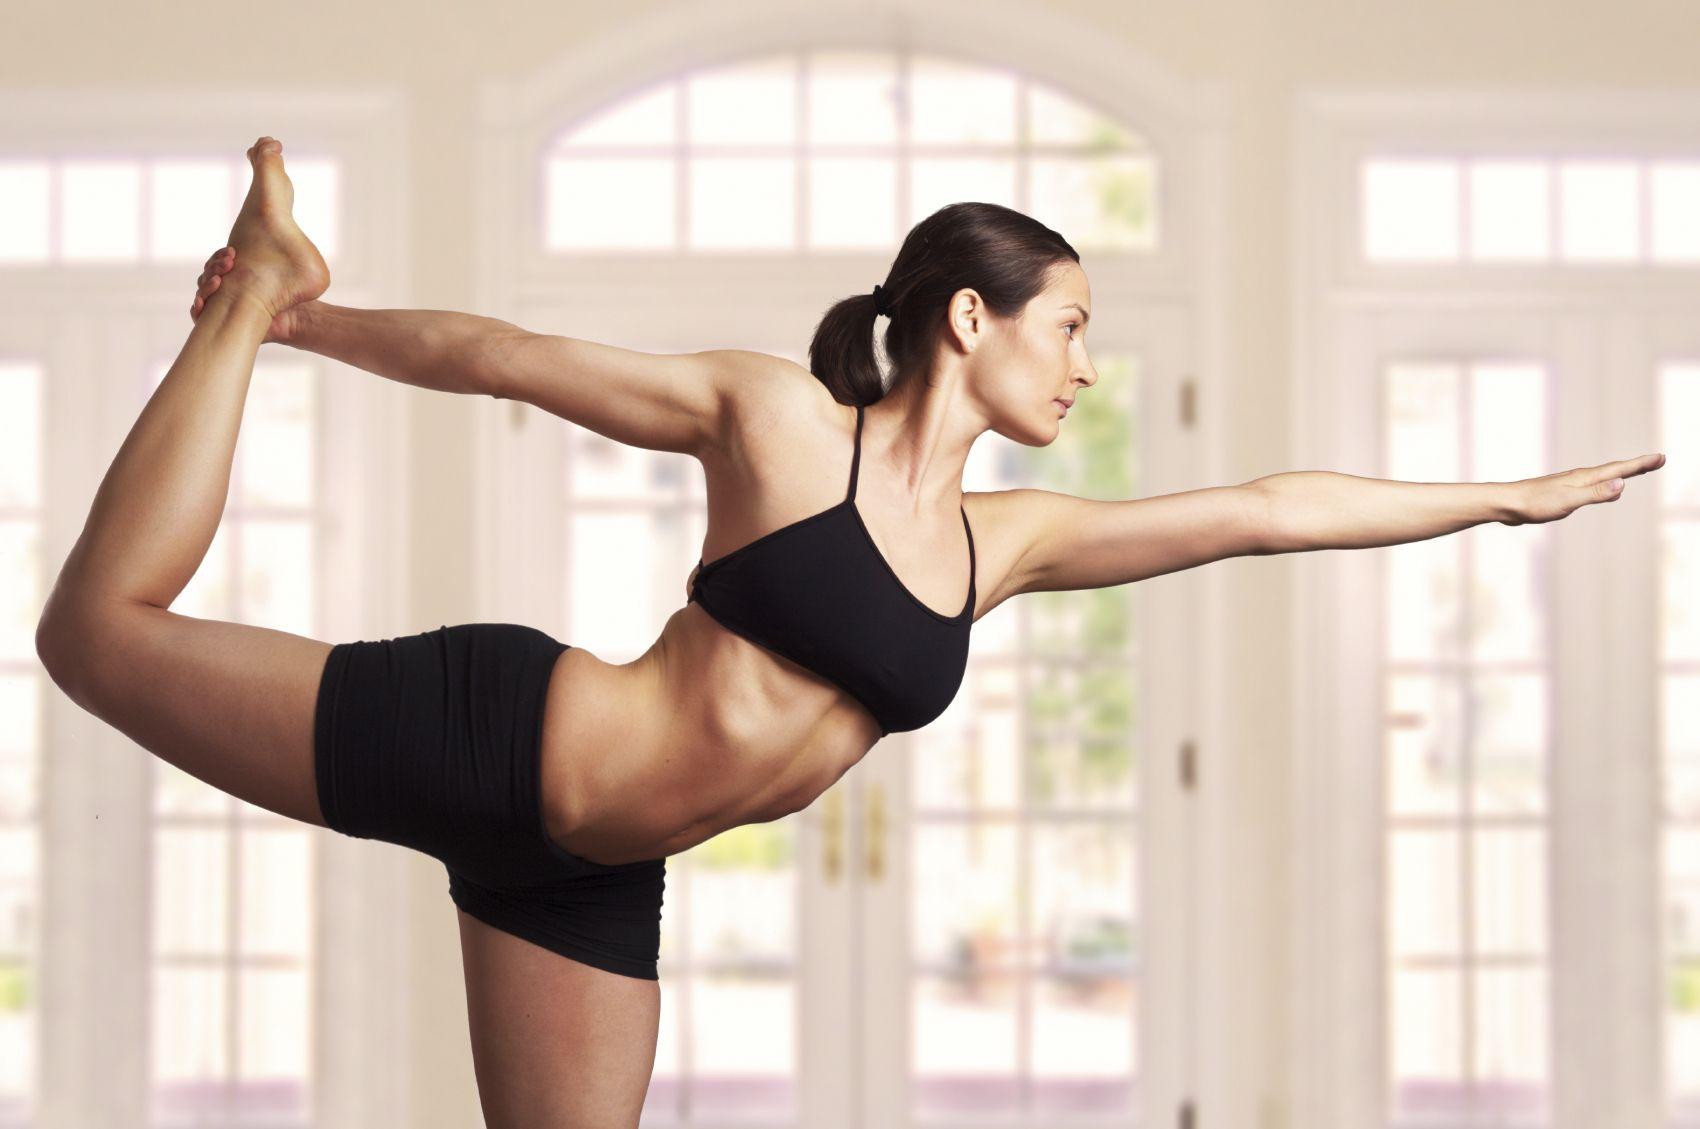 Pilates Health Equipment - Pilates Equipment and Accessories - Australia and New Zealand